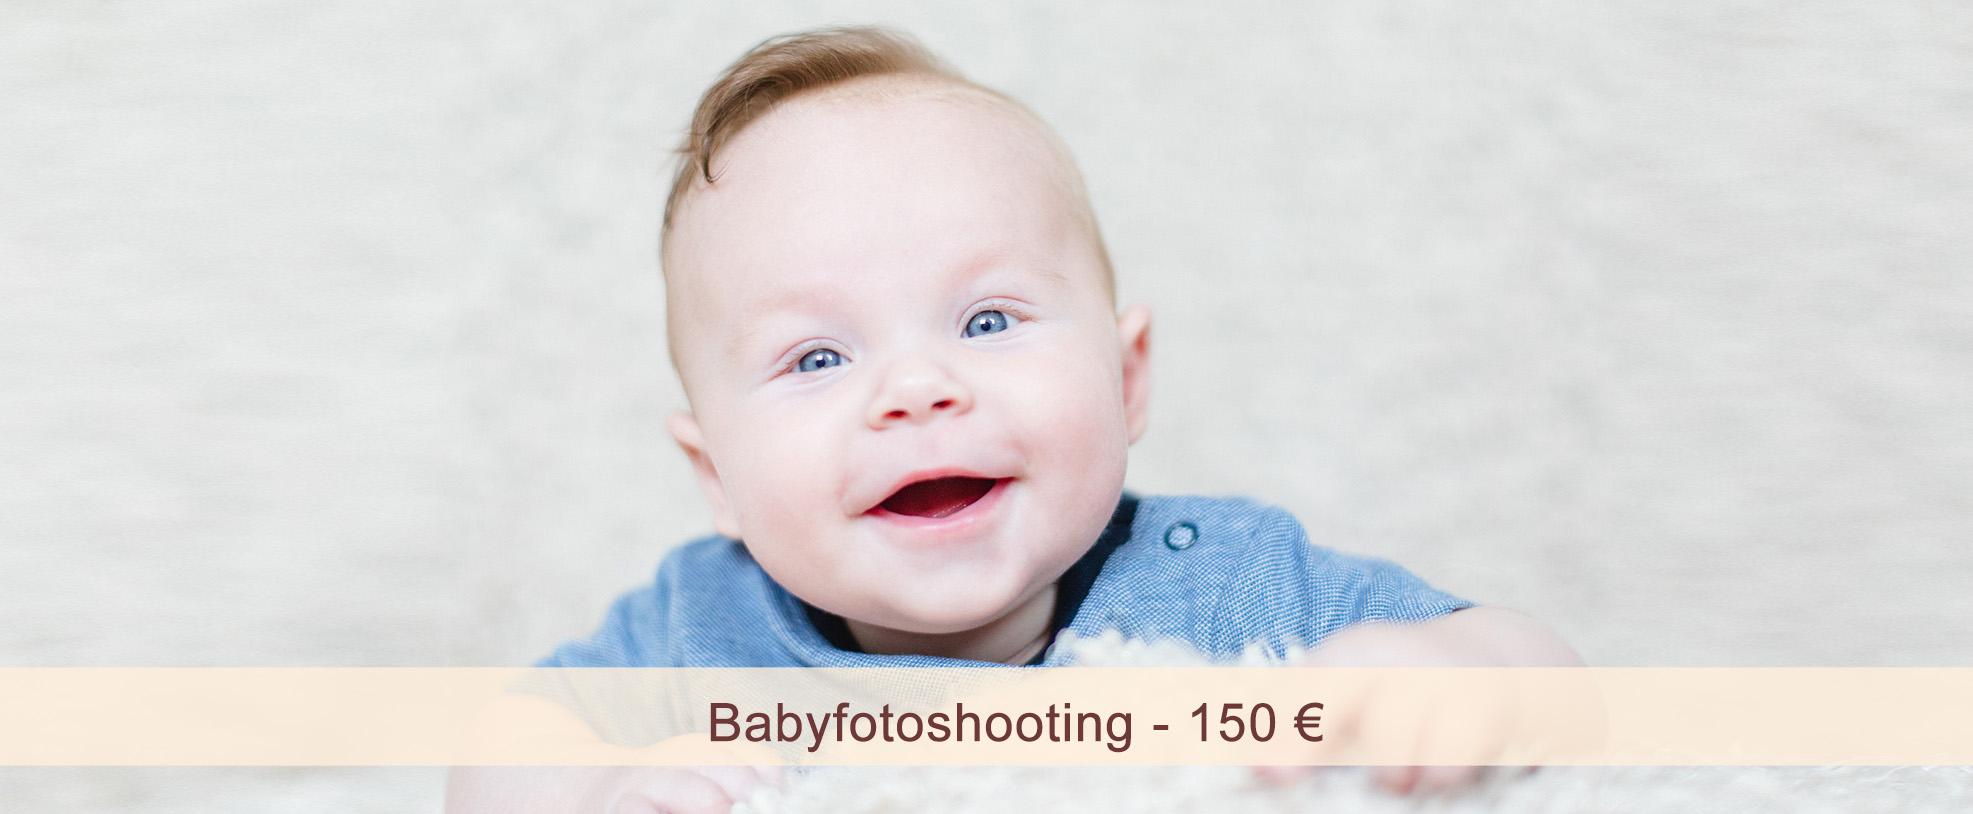 preise-babyshooting-rostock